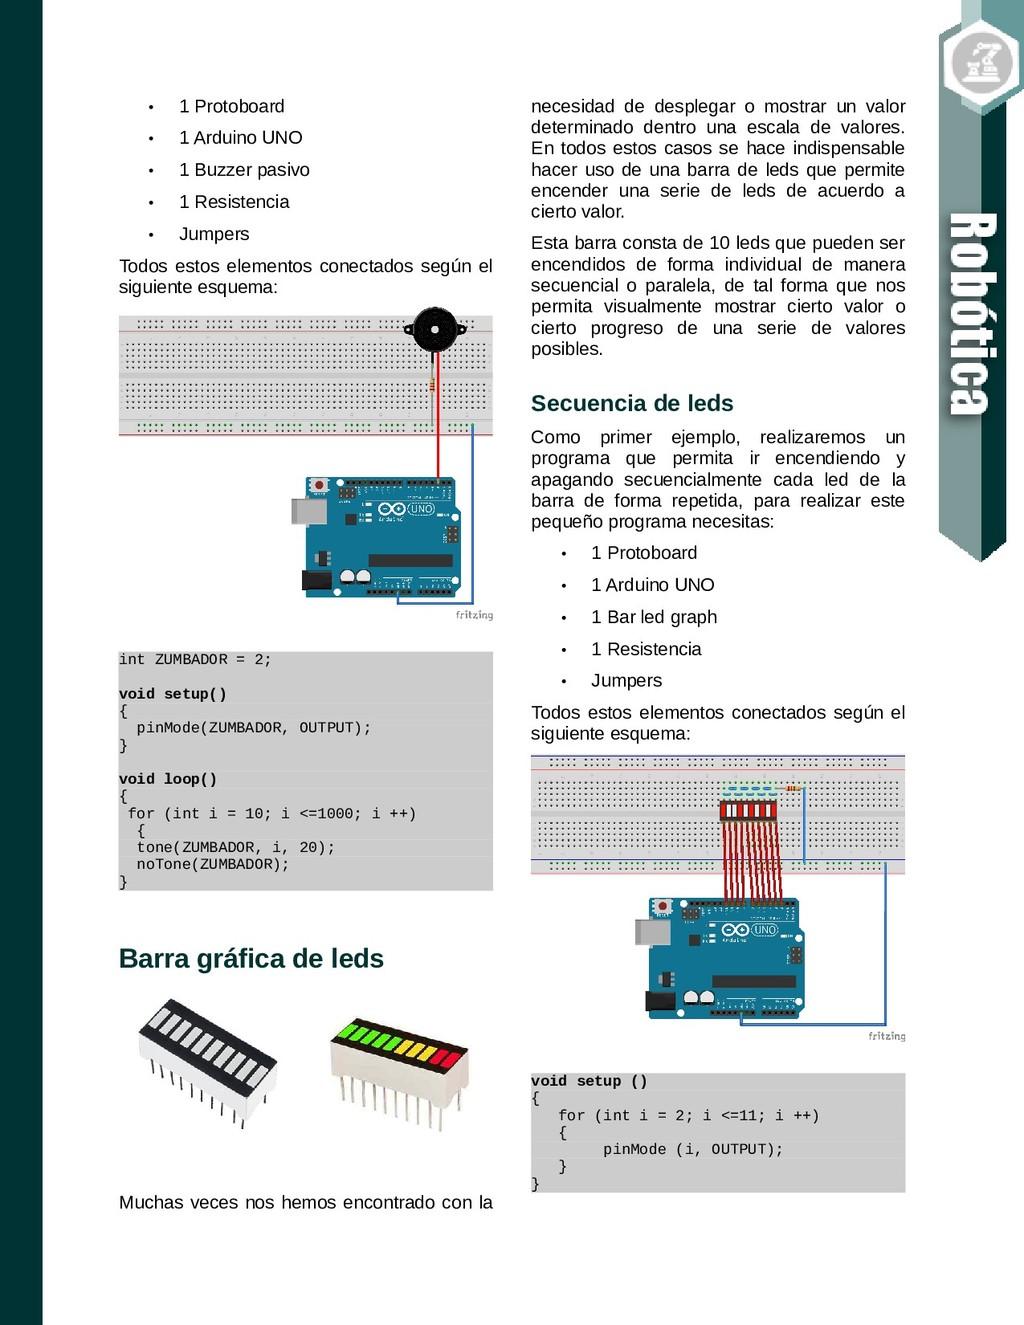 • 1 Protoboard • 1 Arduino UNO • 1 Buzzer pasiv...